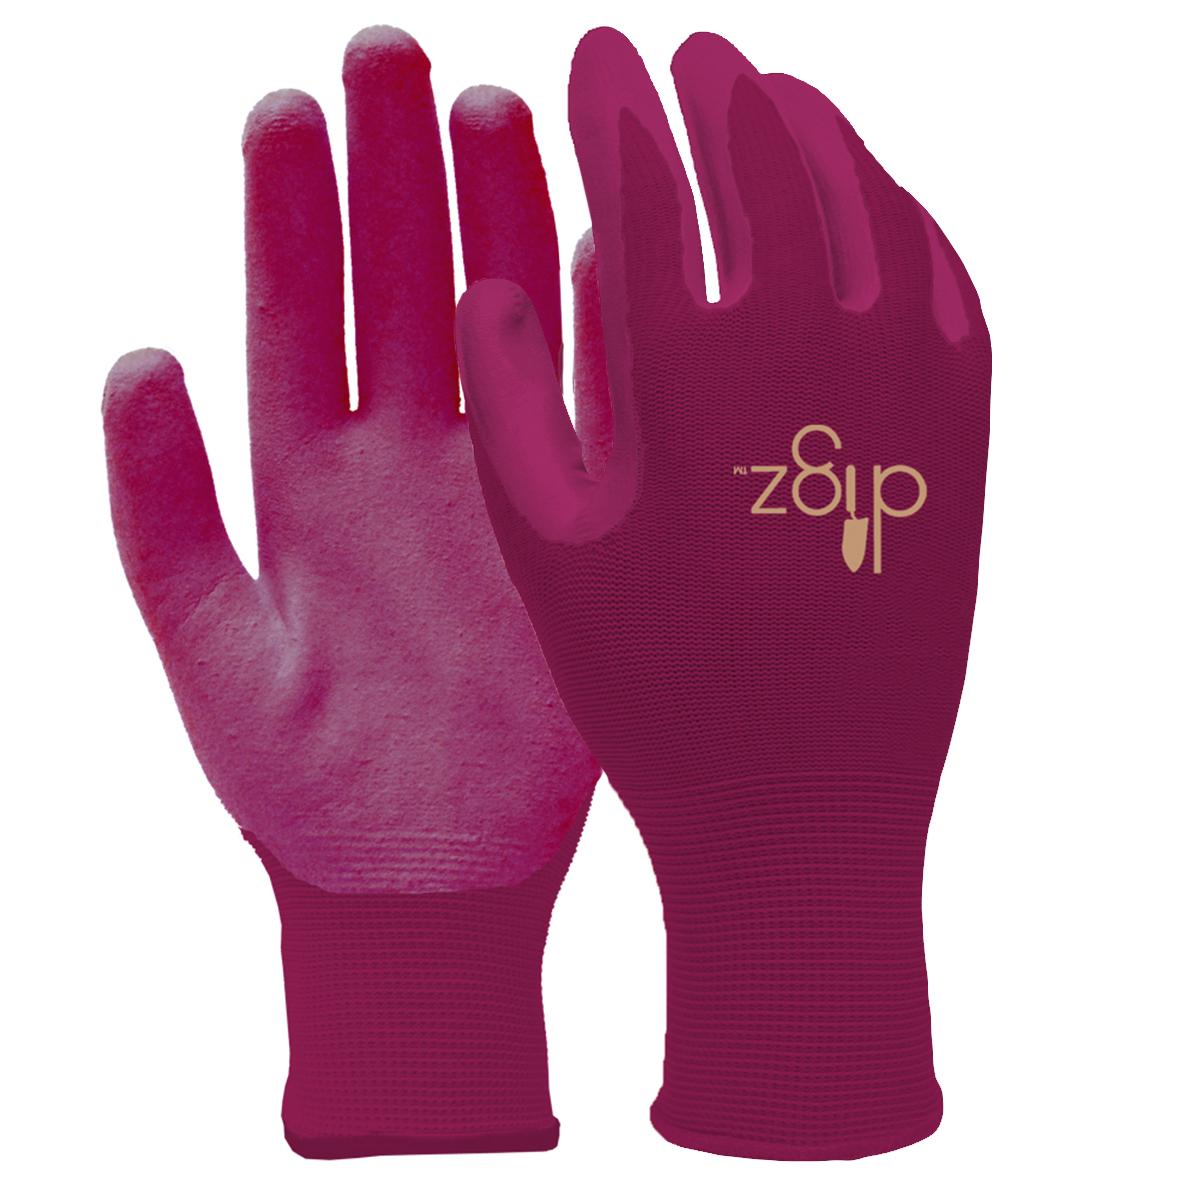 6 pairs digz women nitrile coated gardening gloves ladies for Gardening gloves ladies